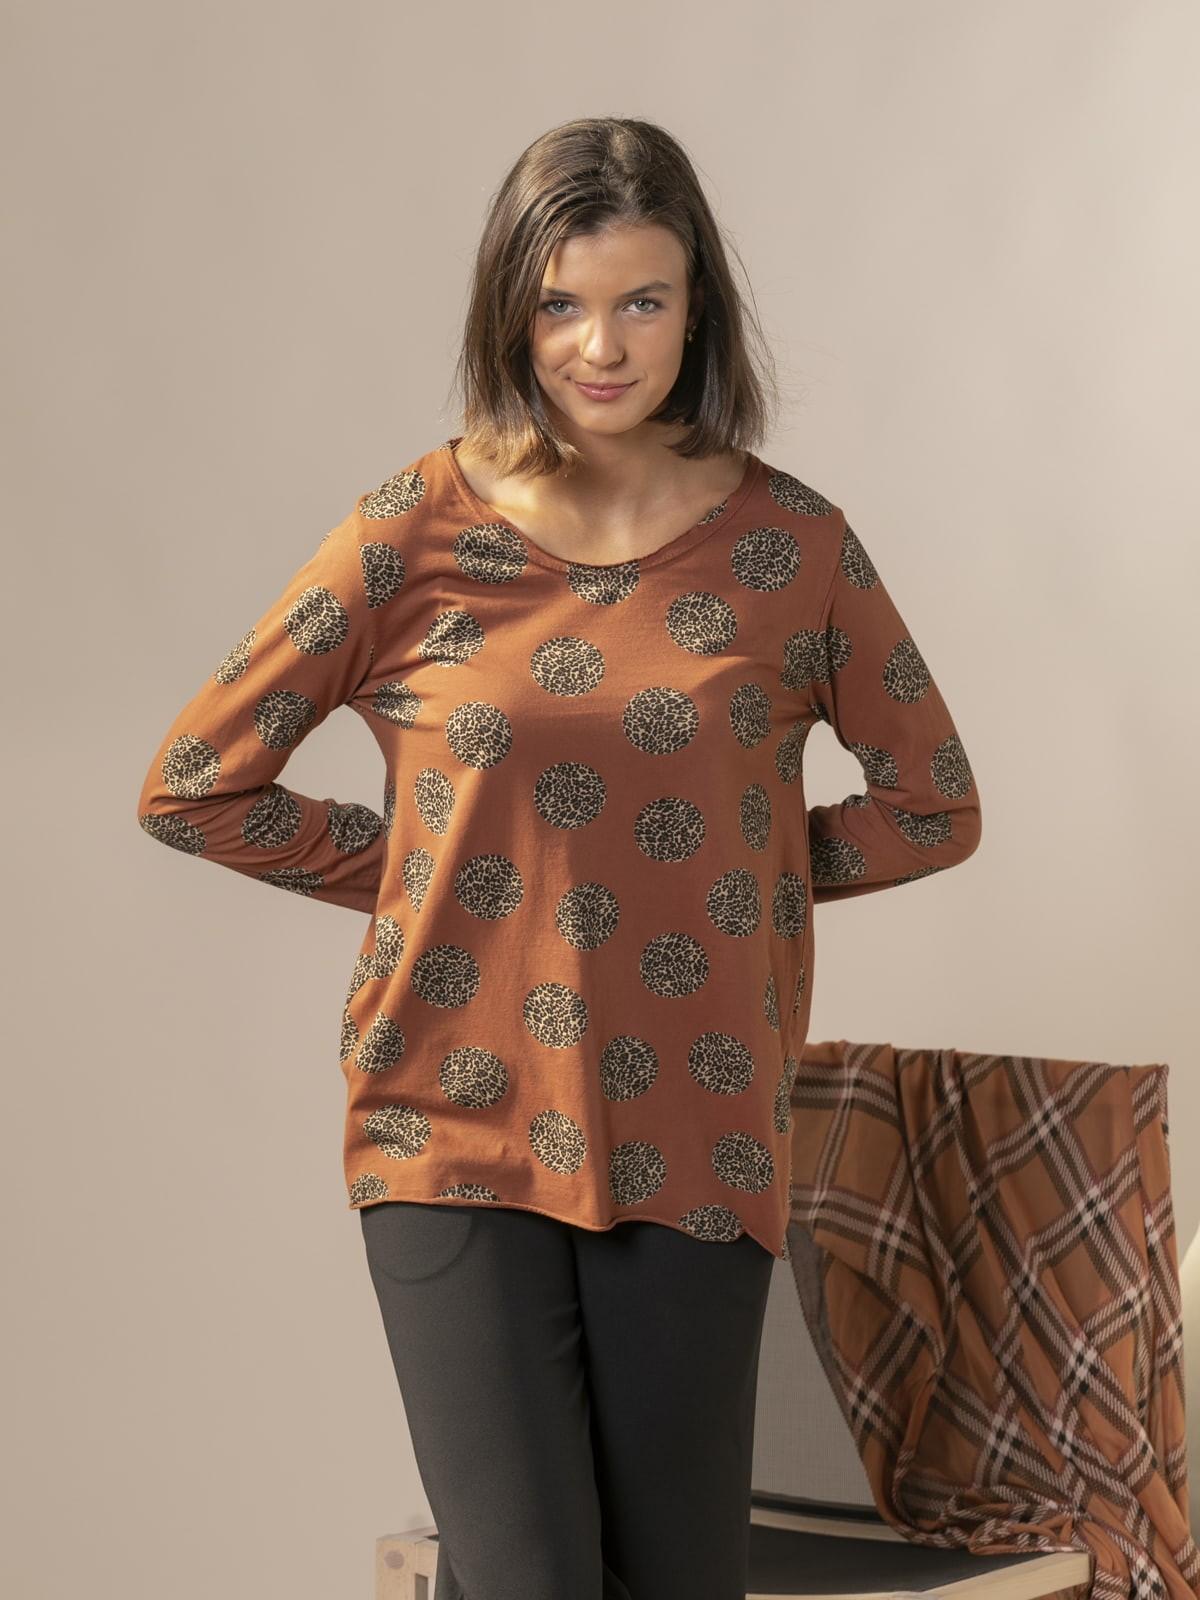 Woman Fantastic animal print t-shirt Tile